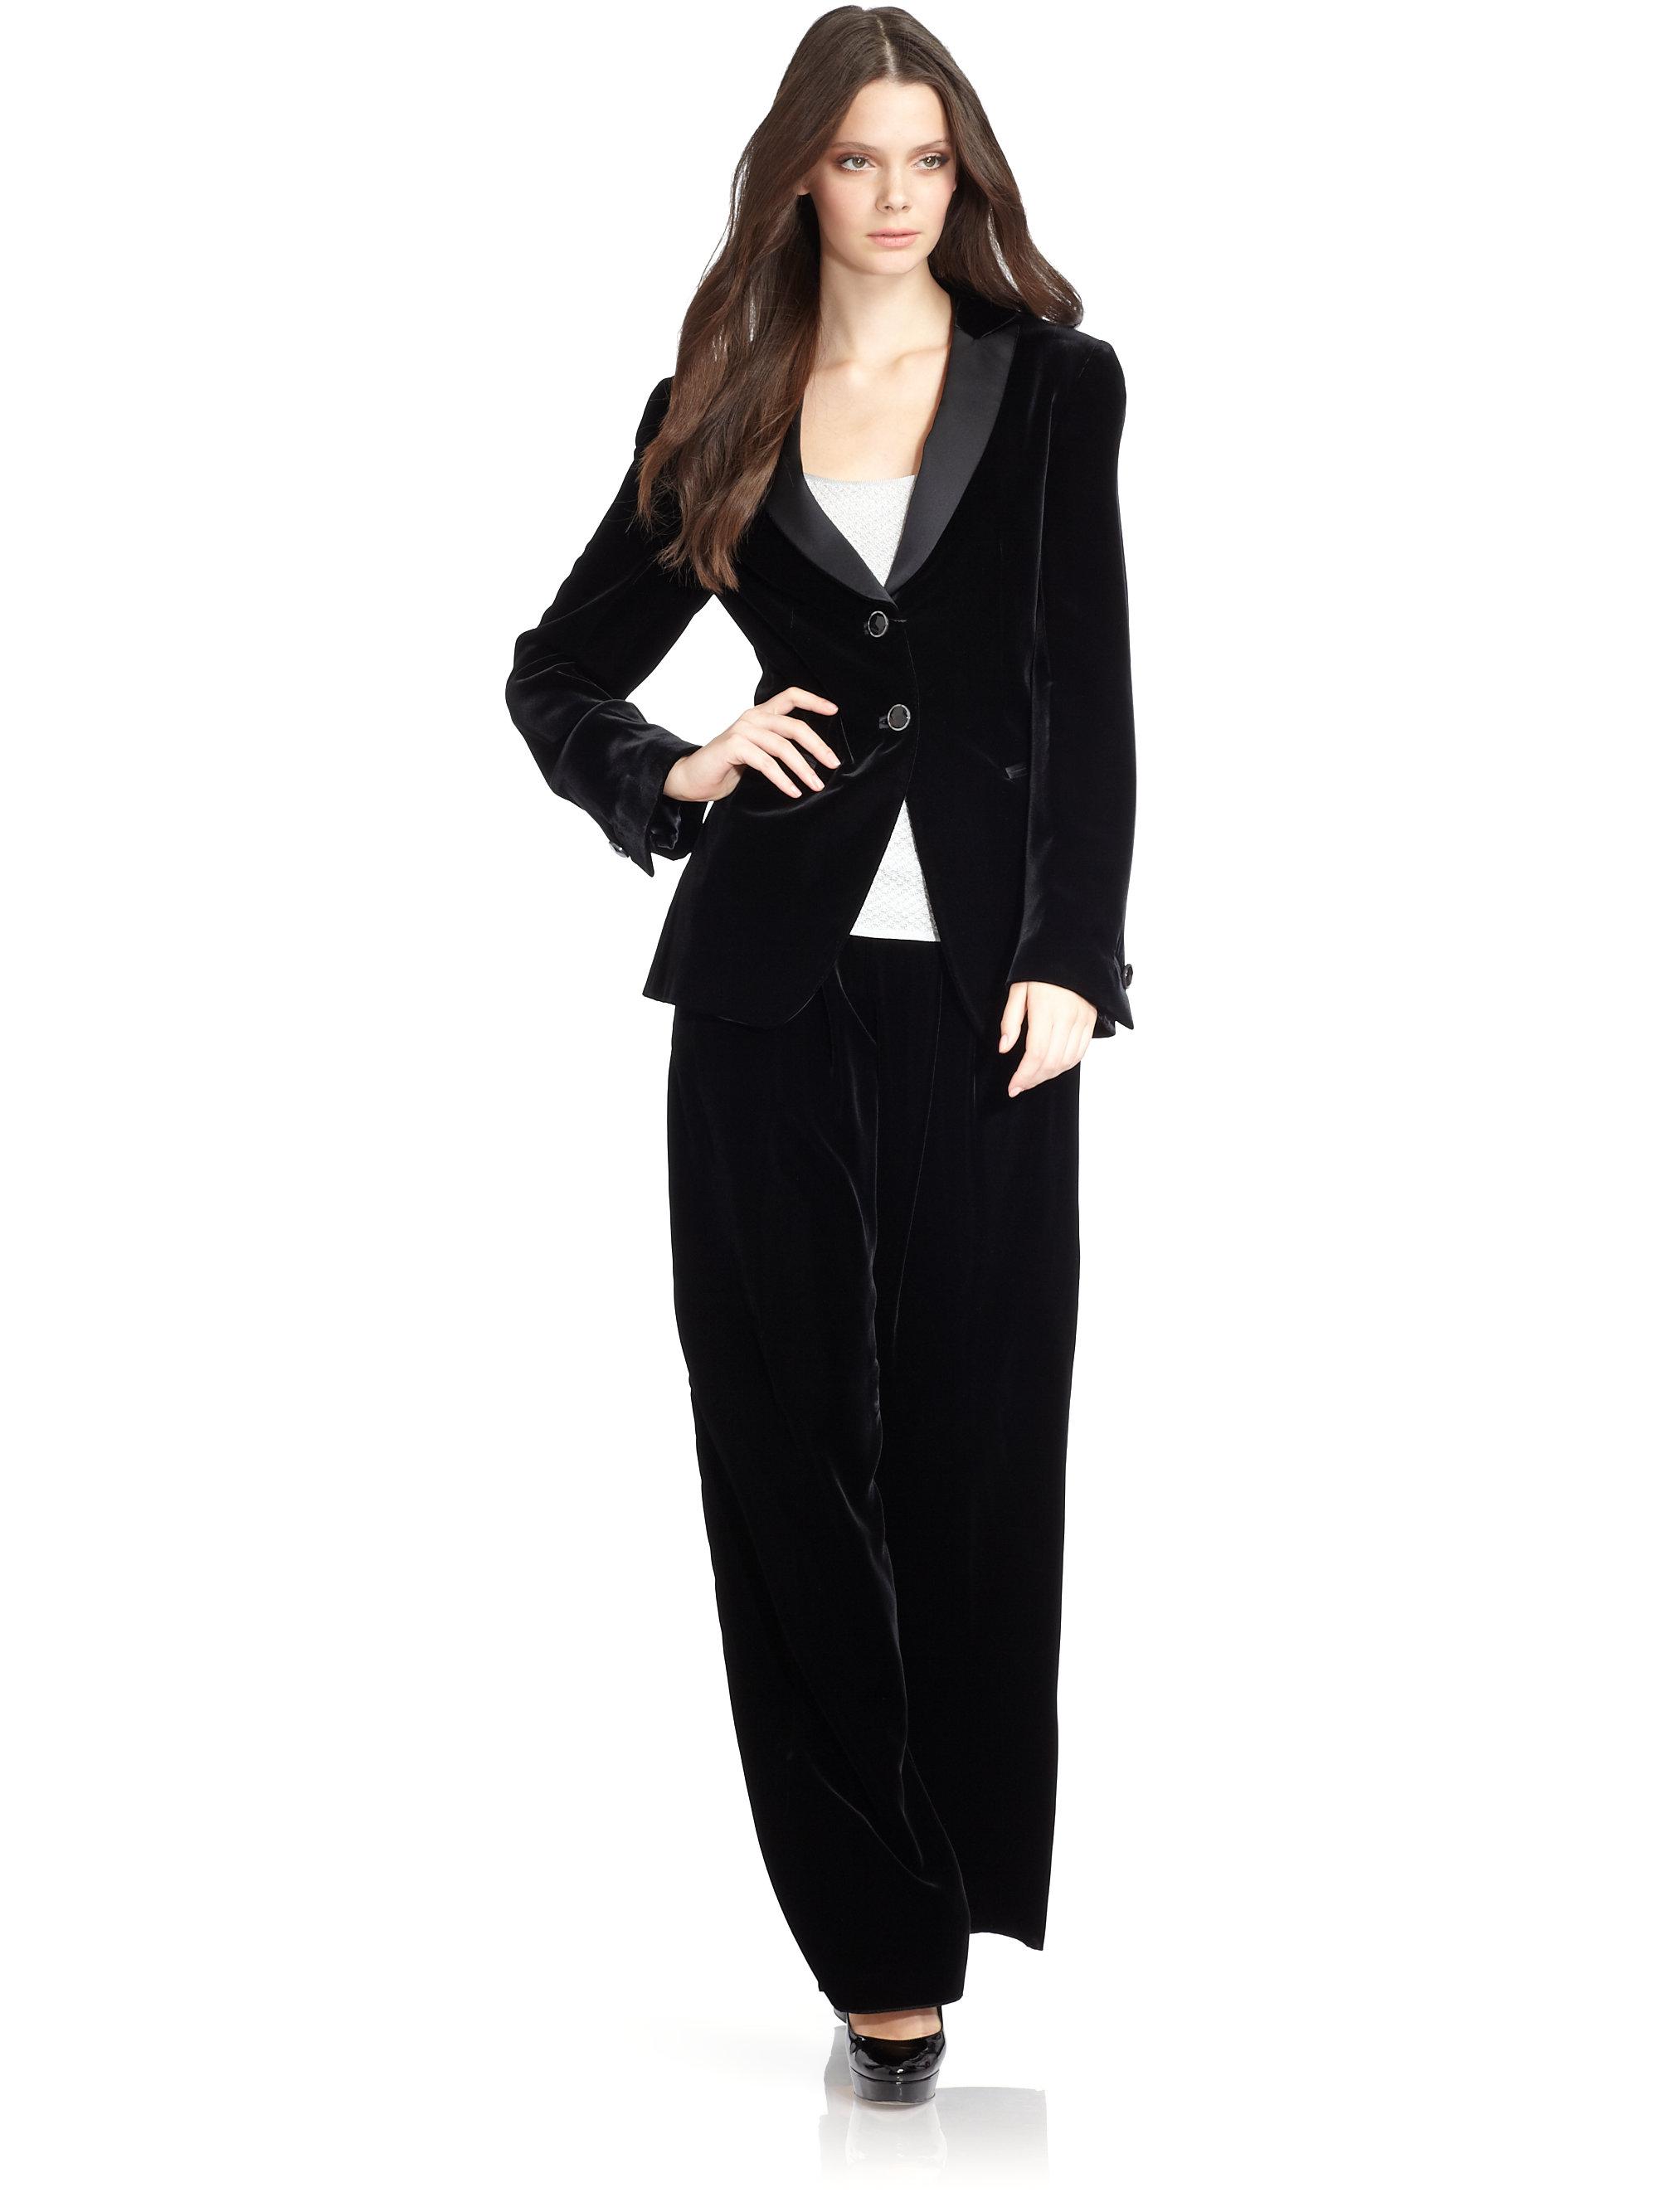 Giorgio Armani Velvet Tuxedo Jacket In Black Lyst